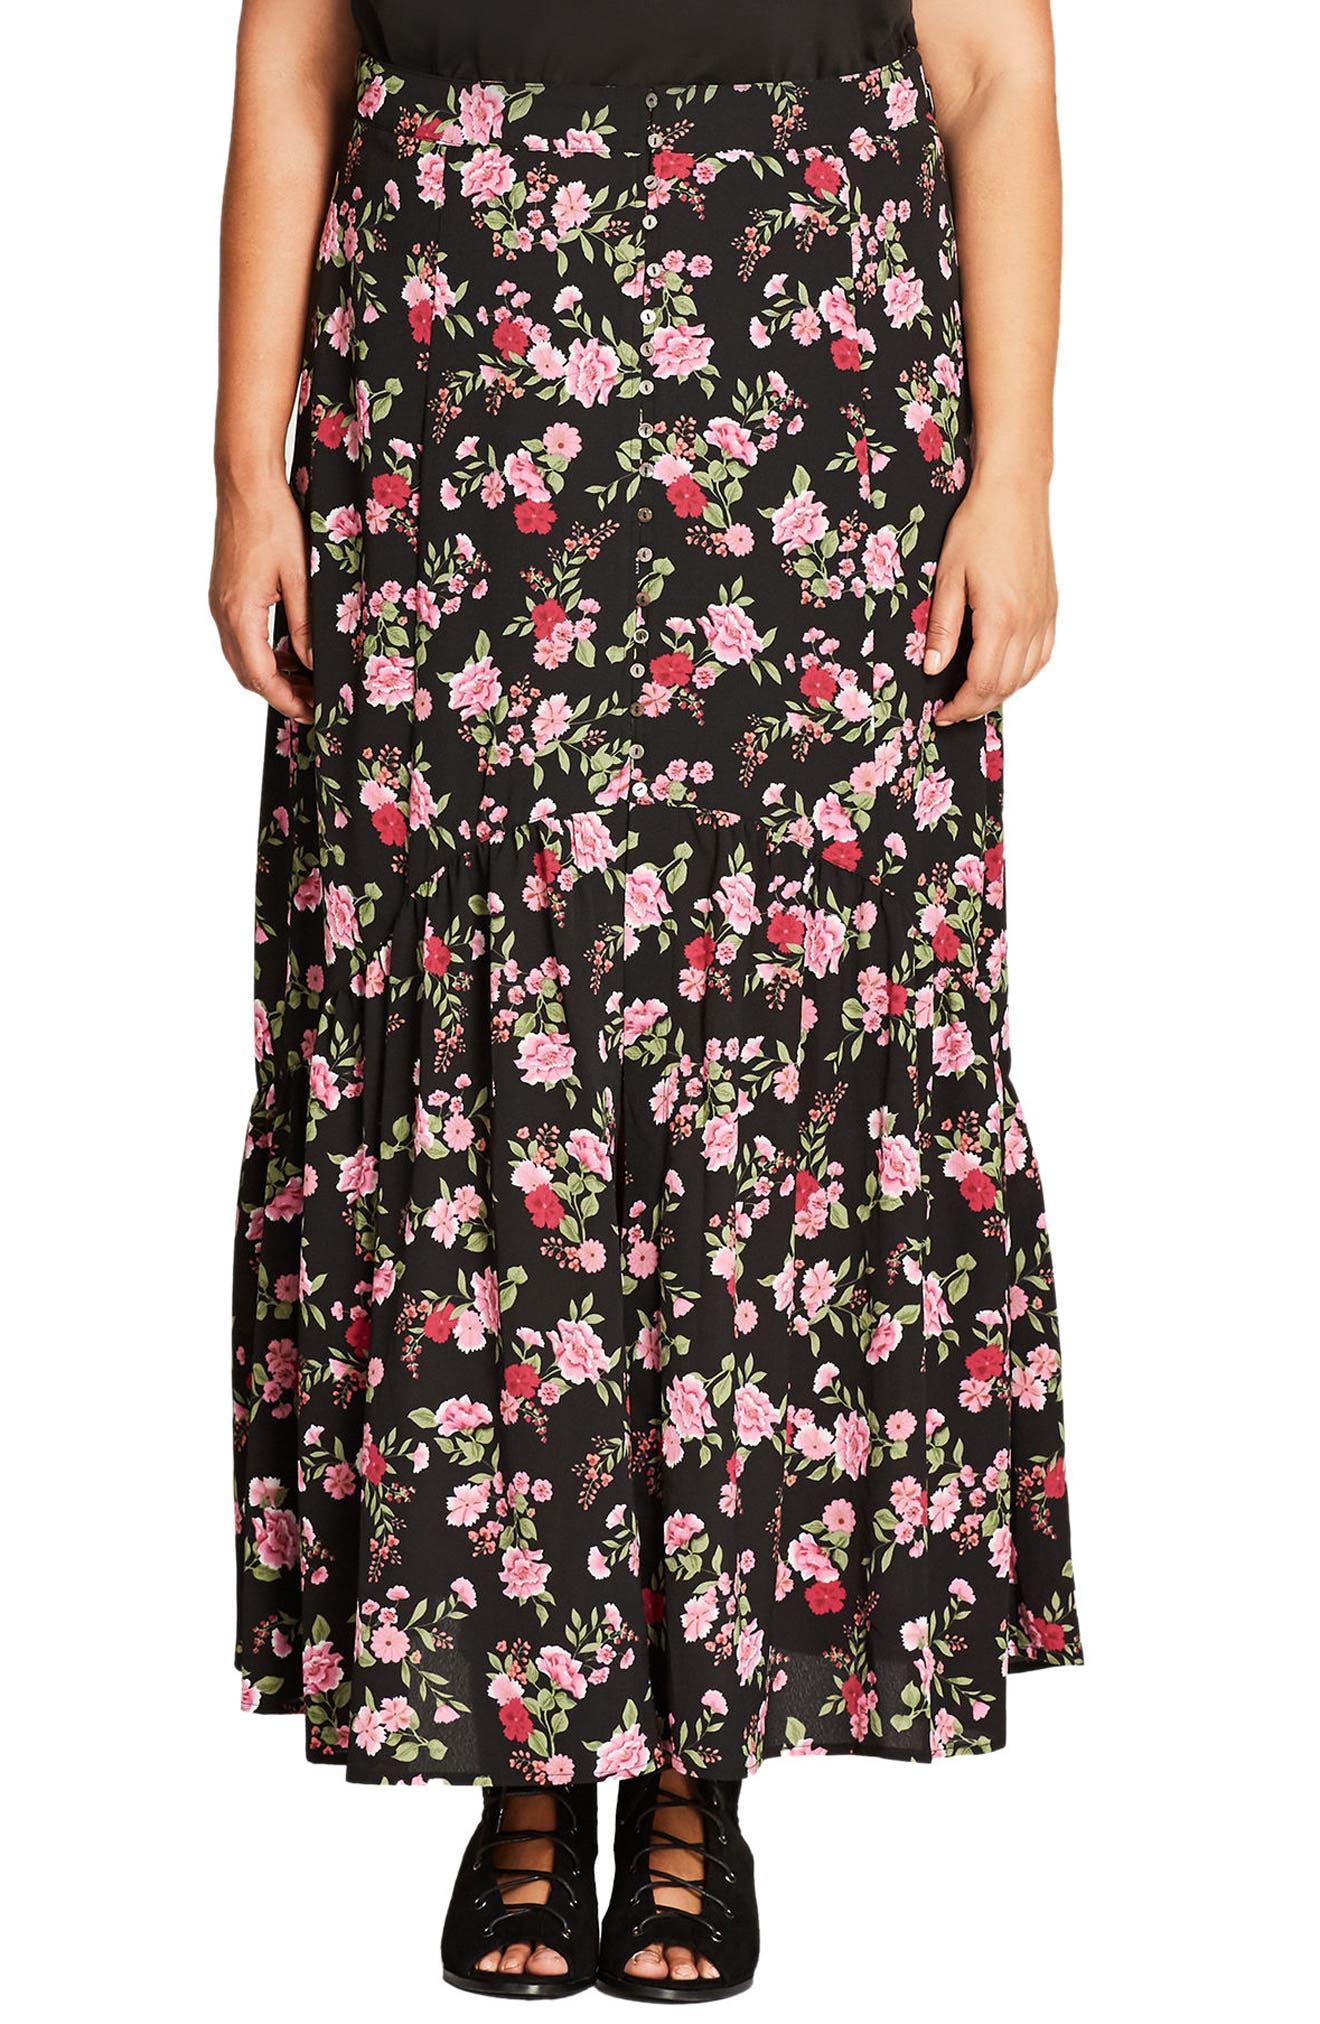 Free Spirit Maxi Skirt,                             Main thumbnail 1, color,                             602